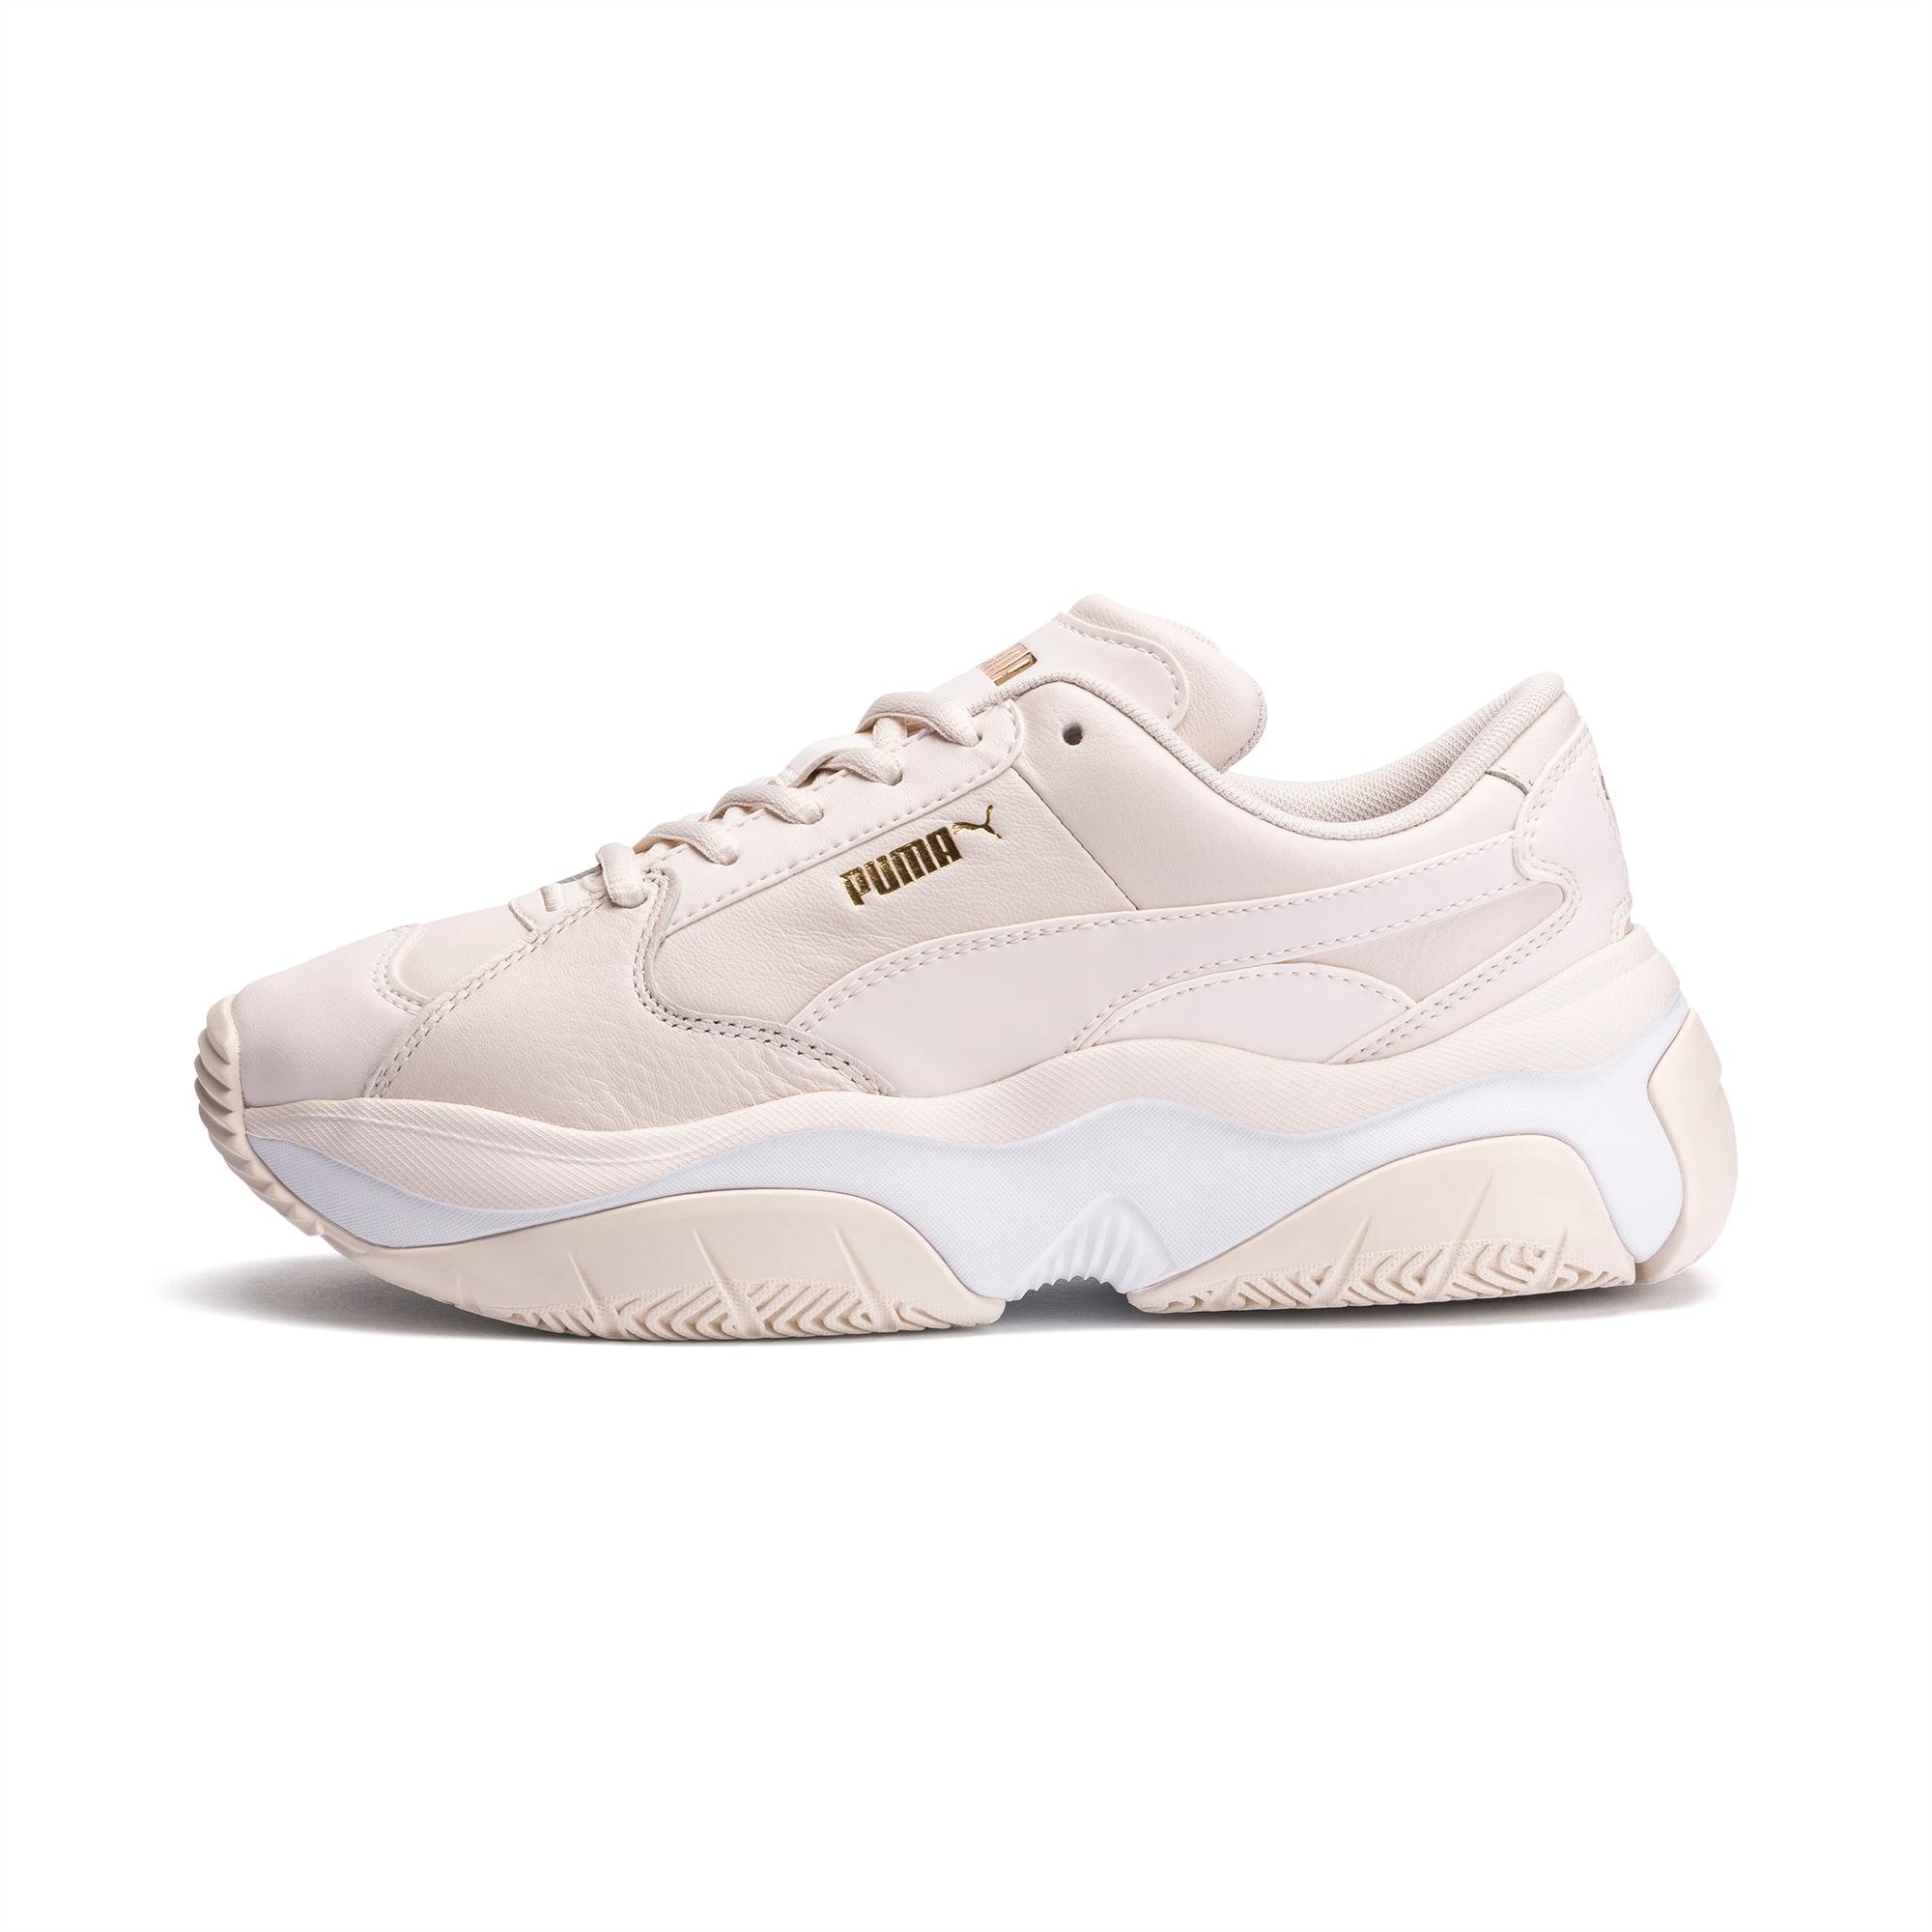 Puma Storm Y Dames Schoenen